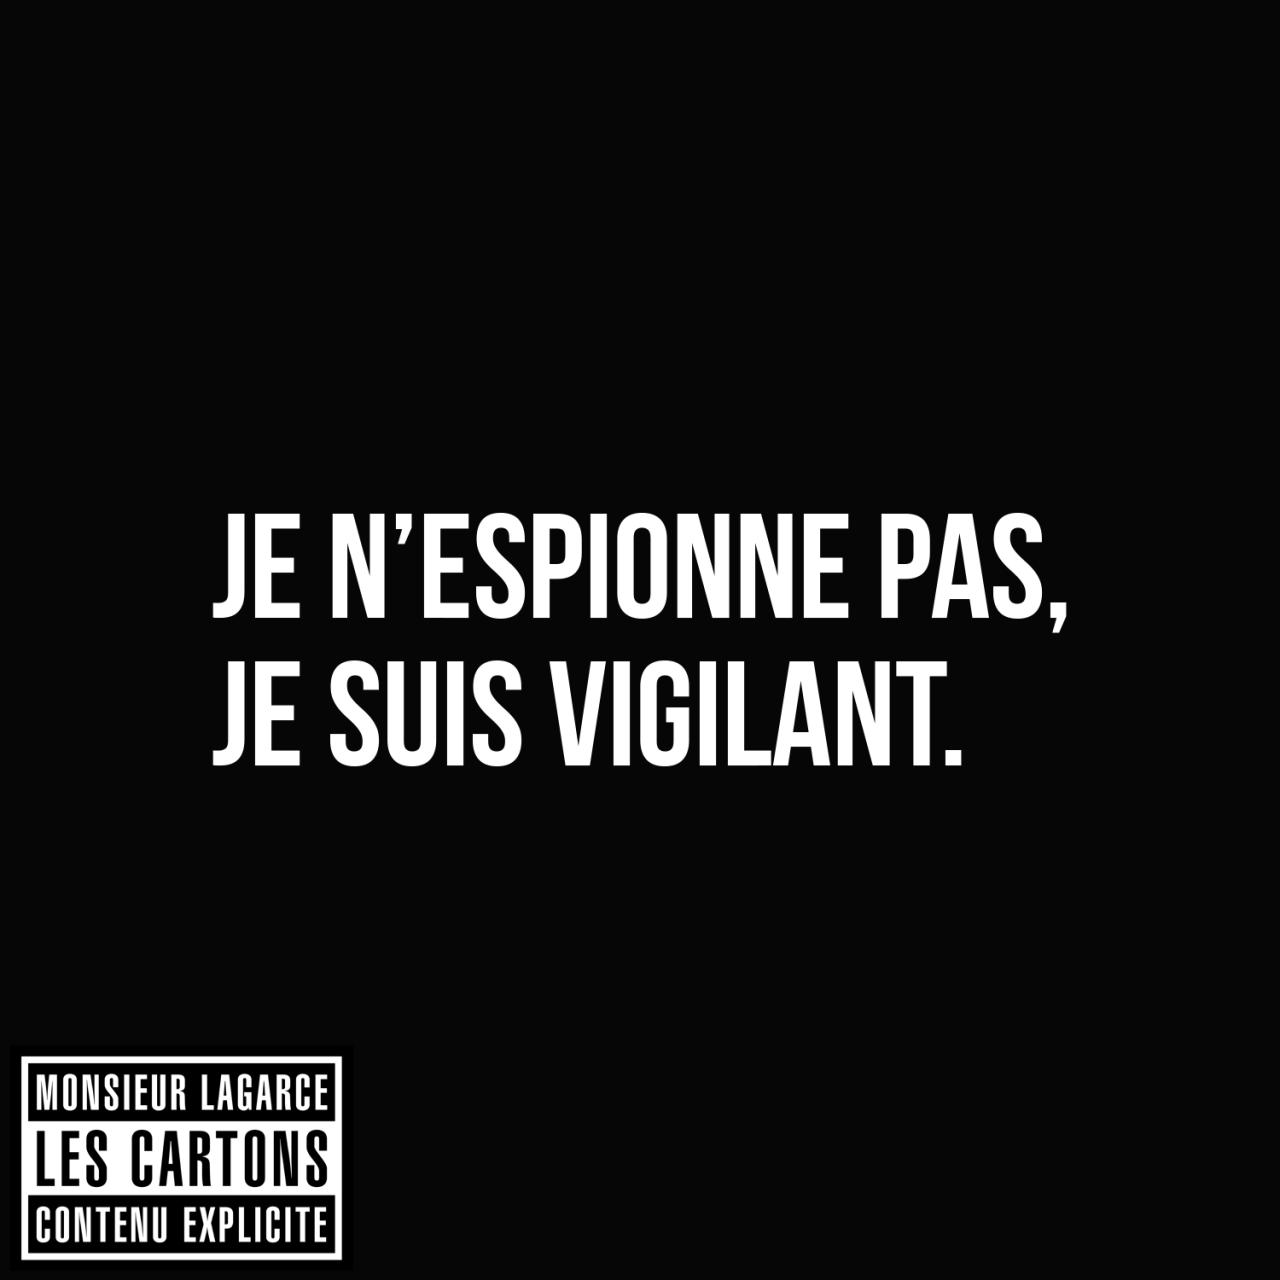 LES CARTONS : Photo